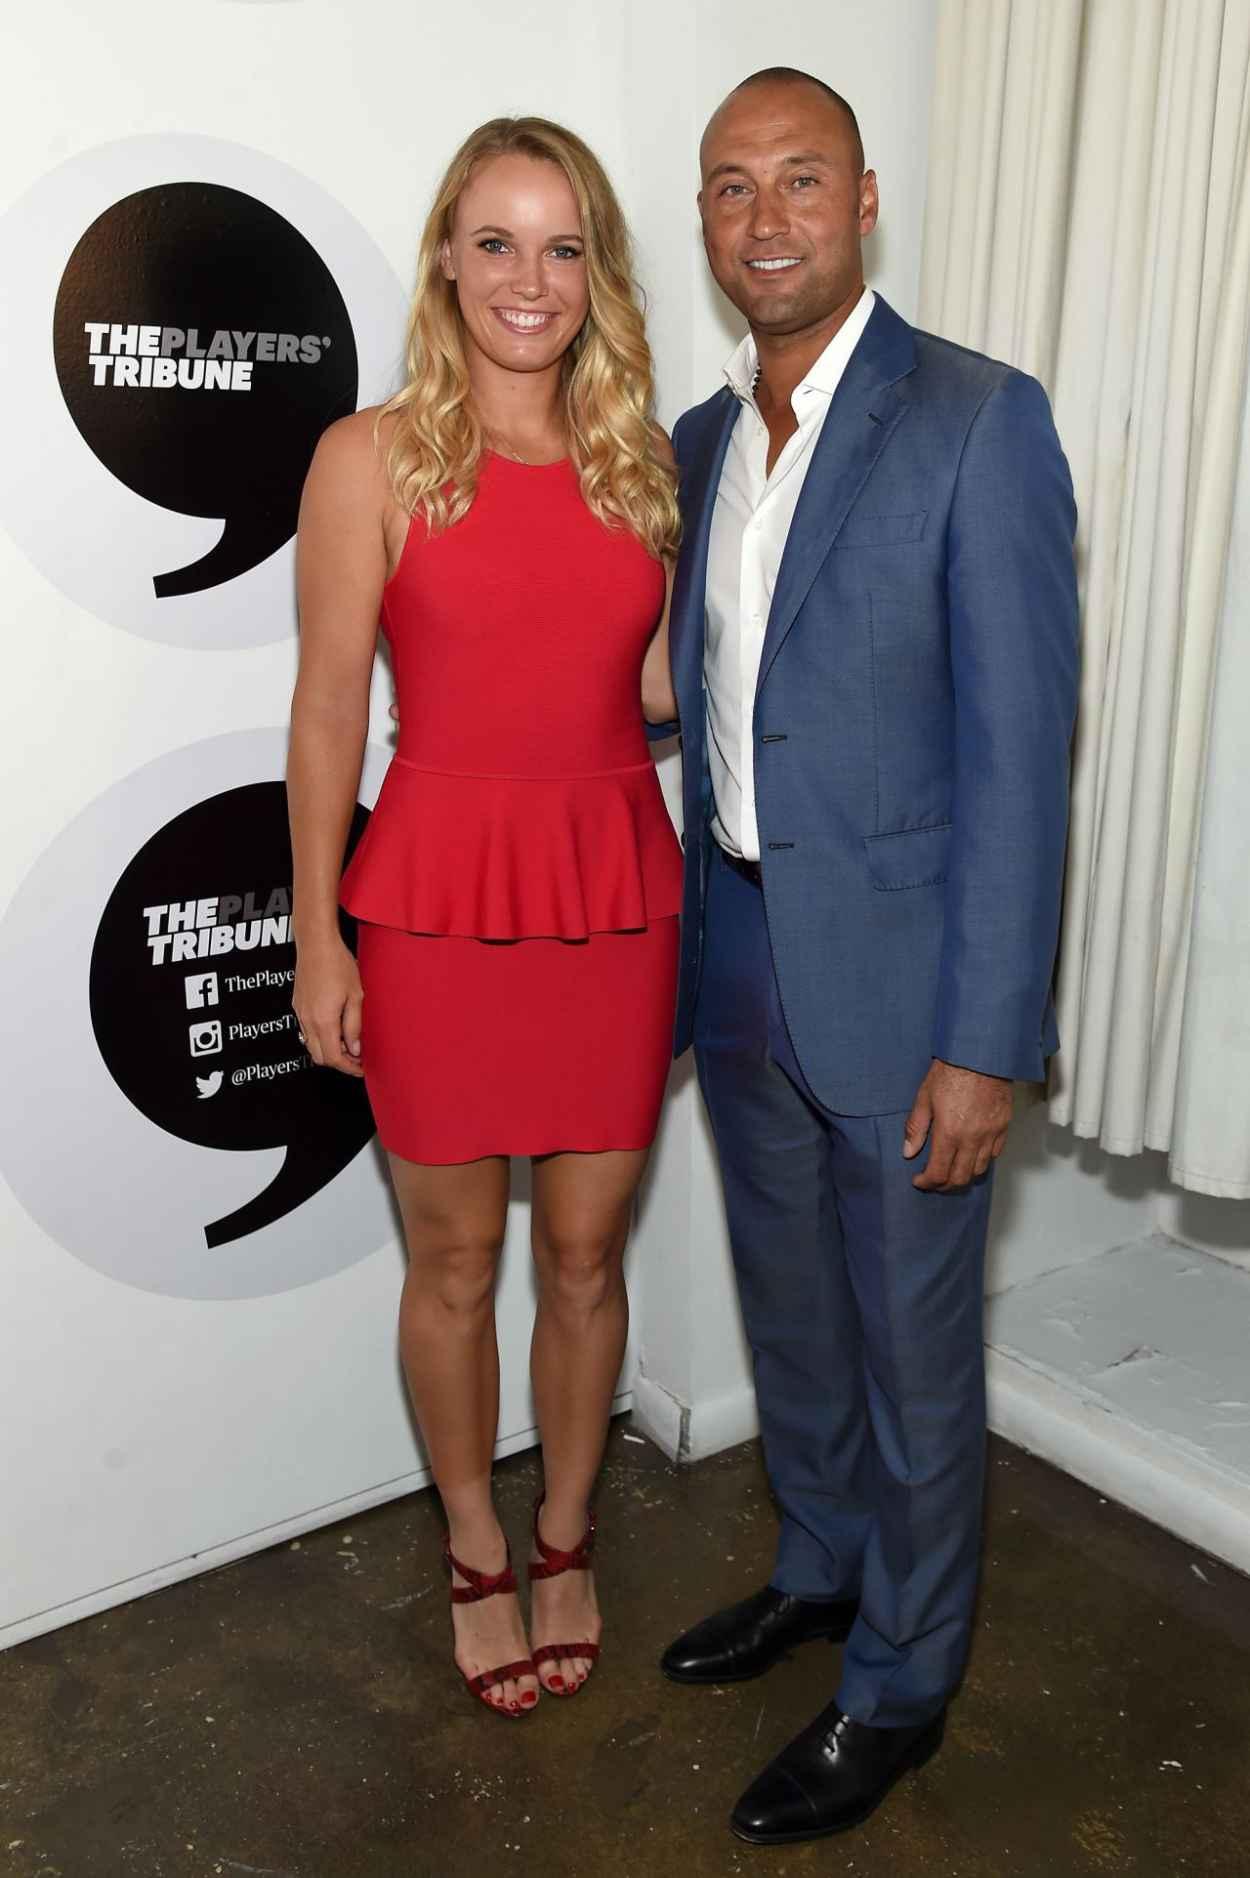 Caroline Wozniacki - Players Tribune Party to celebrate Women in Sports and the 2015 U.S. Open in New York City-5